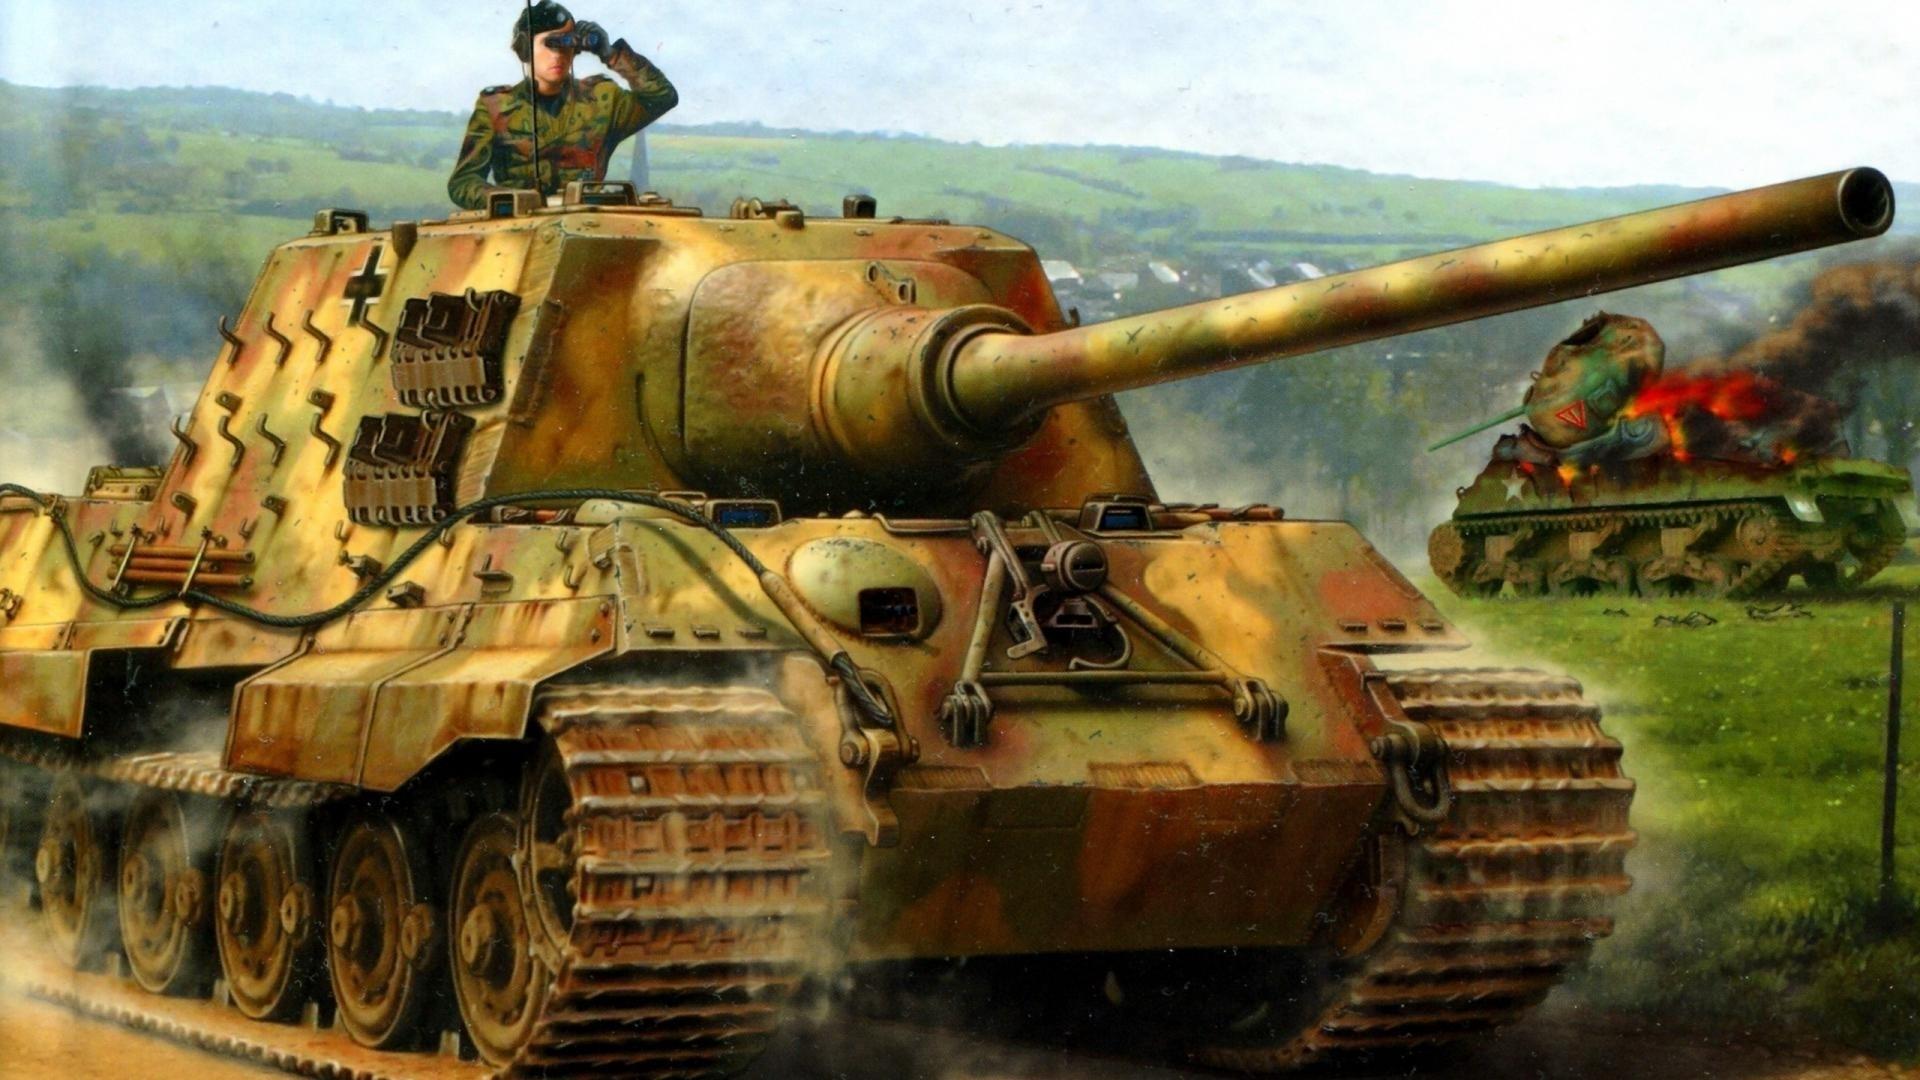 king tiger tank wallpaper (74+ images)